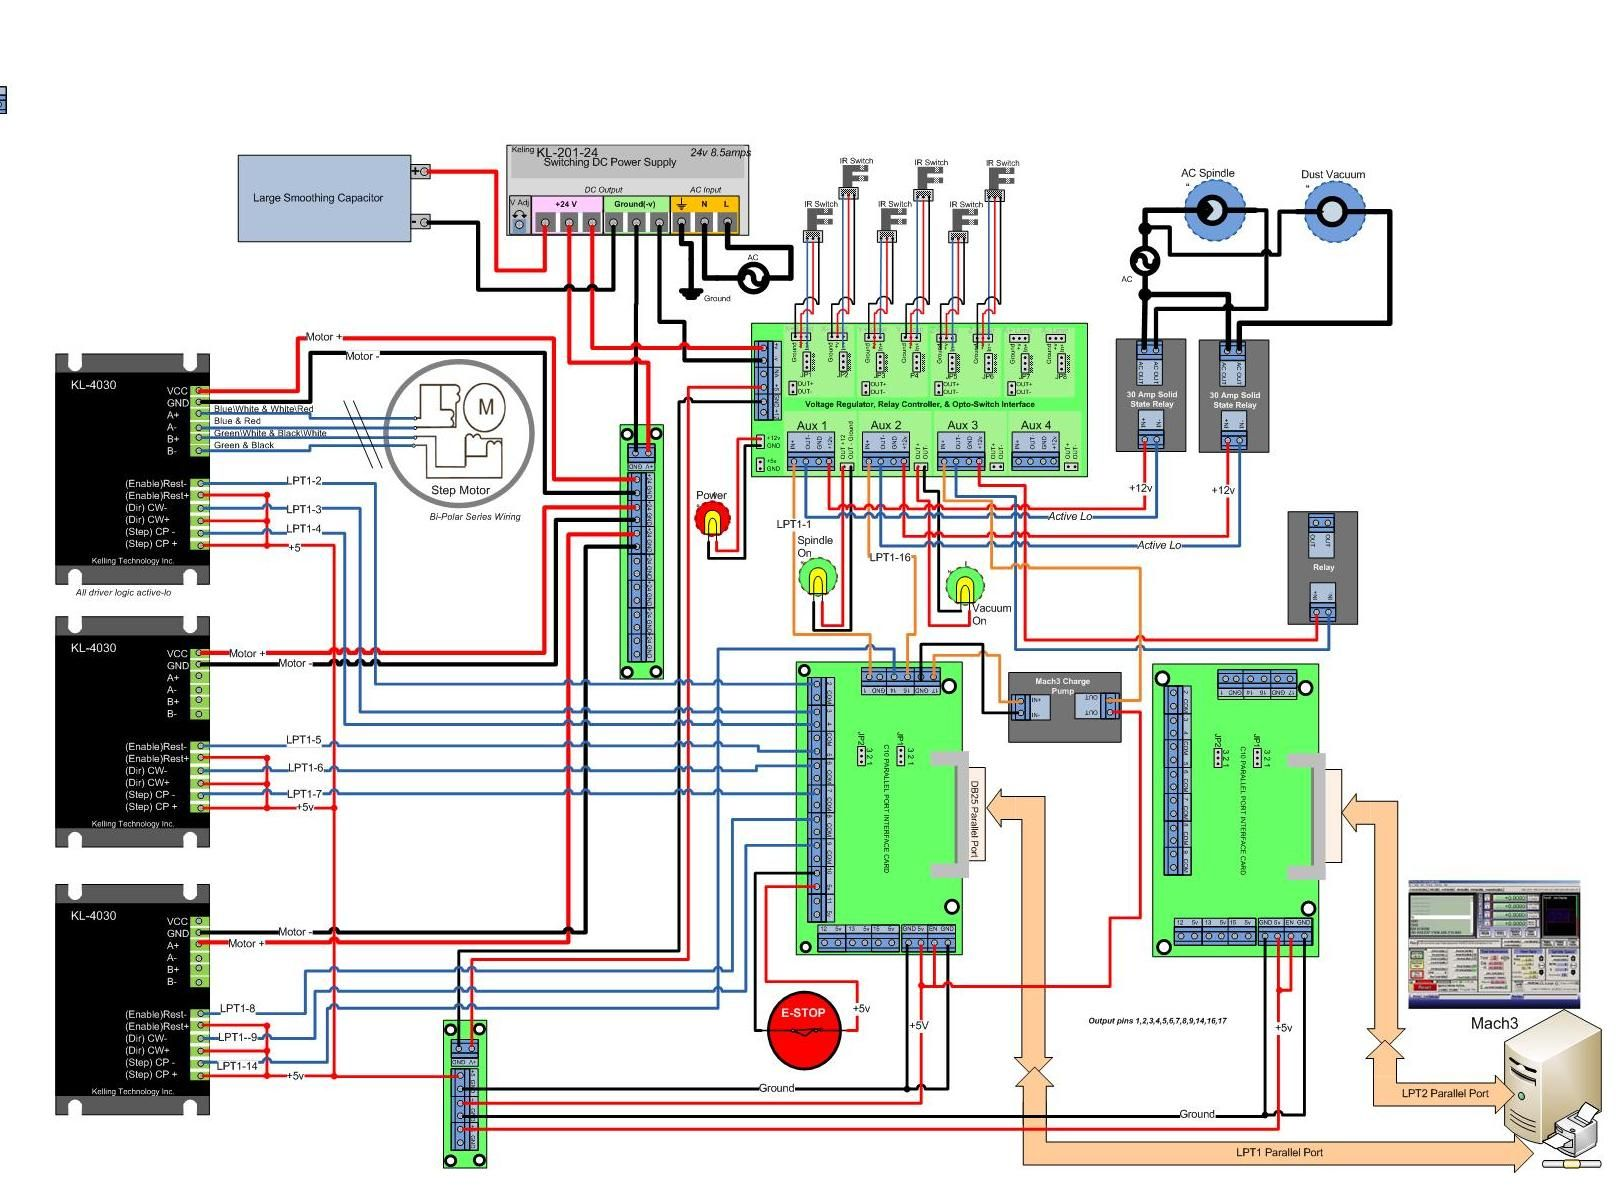 cnc router wiring diagram of dol motor starter help great installation w 2018 pinterest 6040 schematic